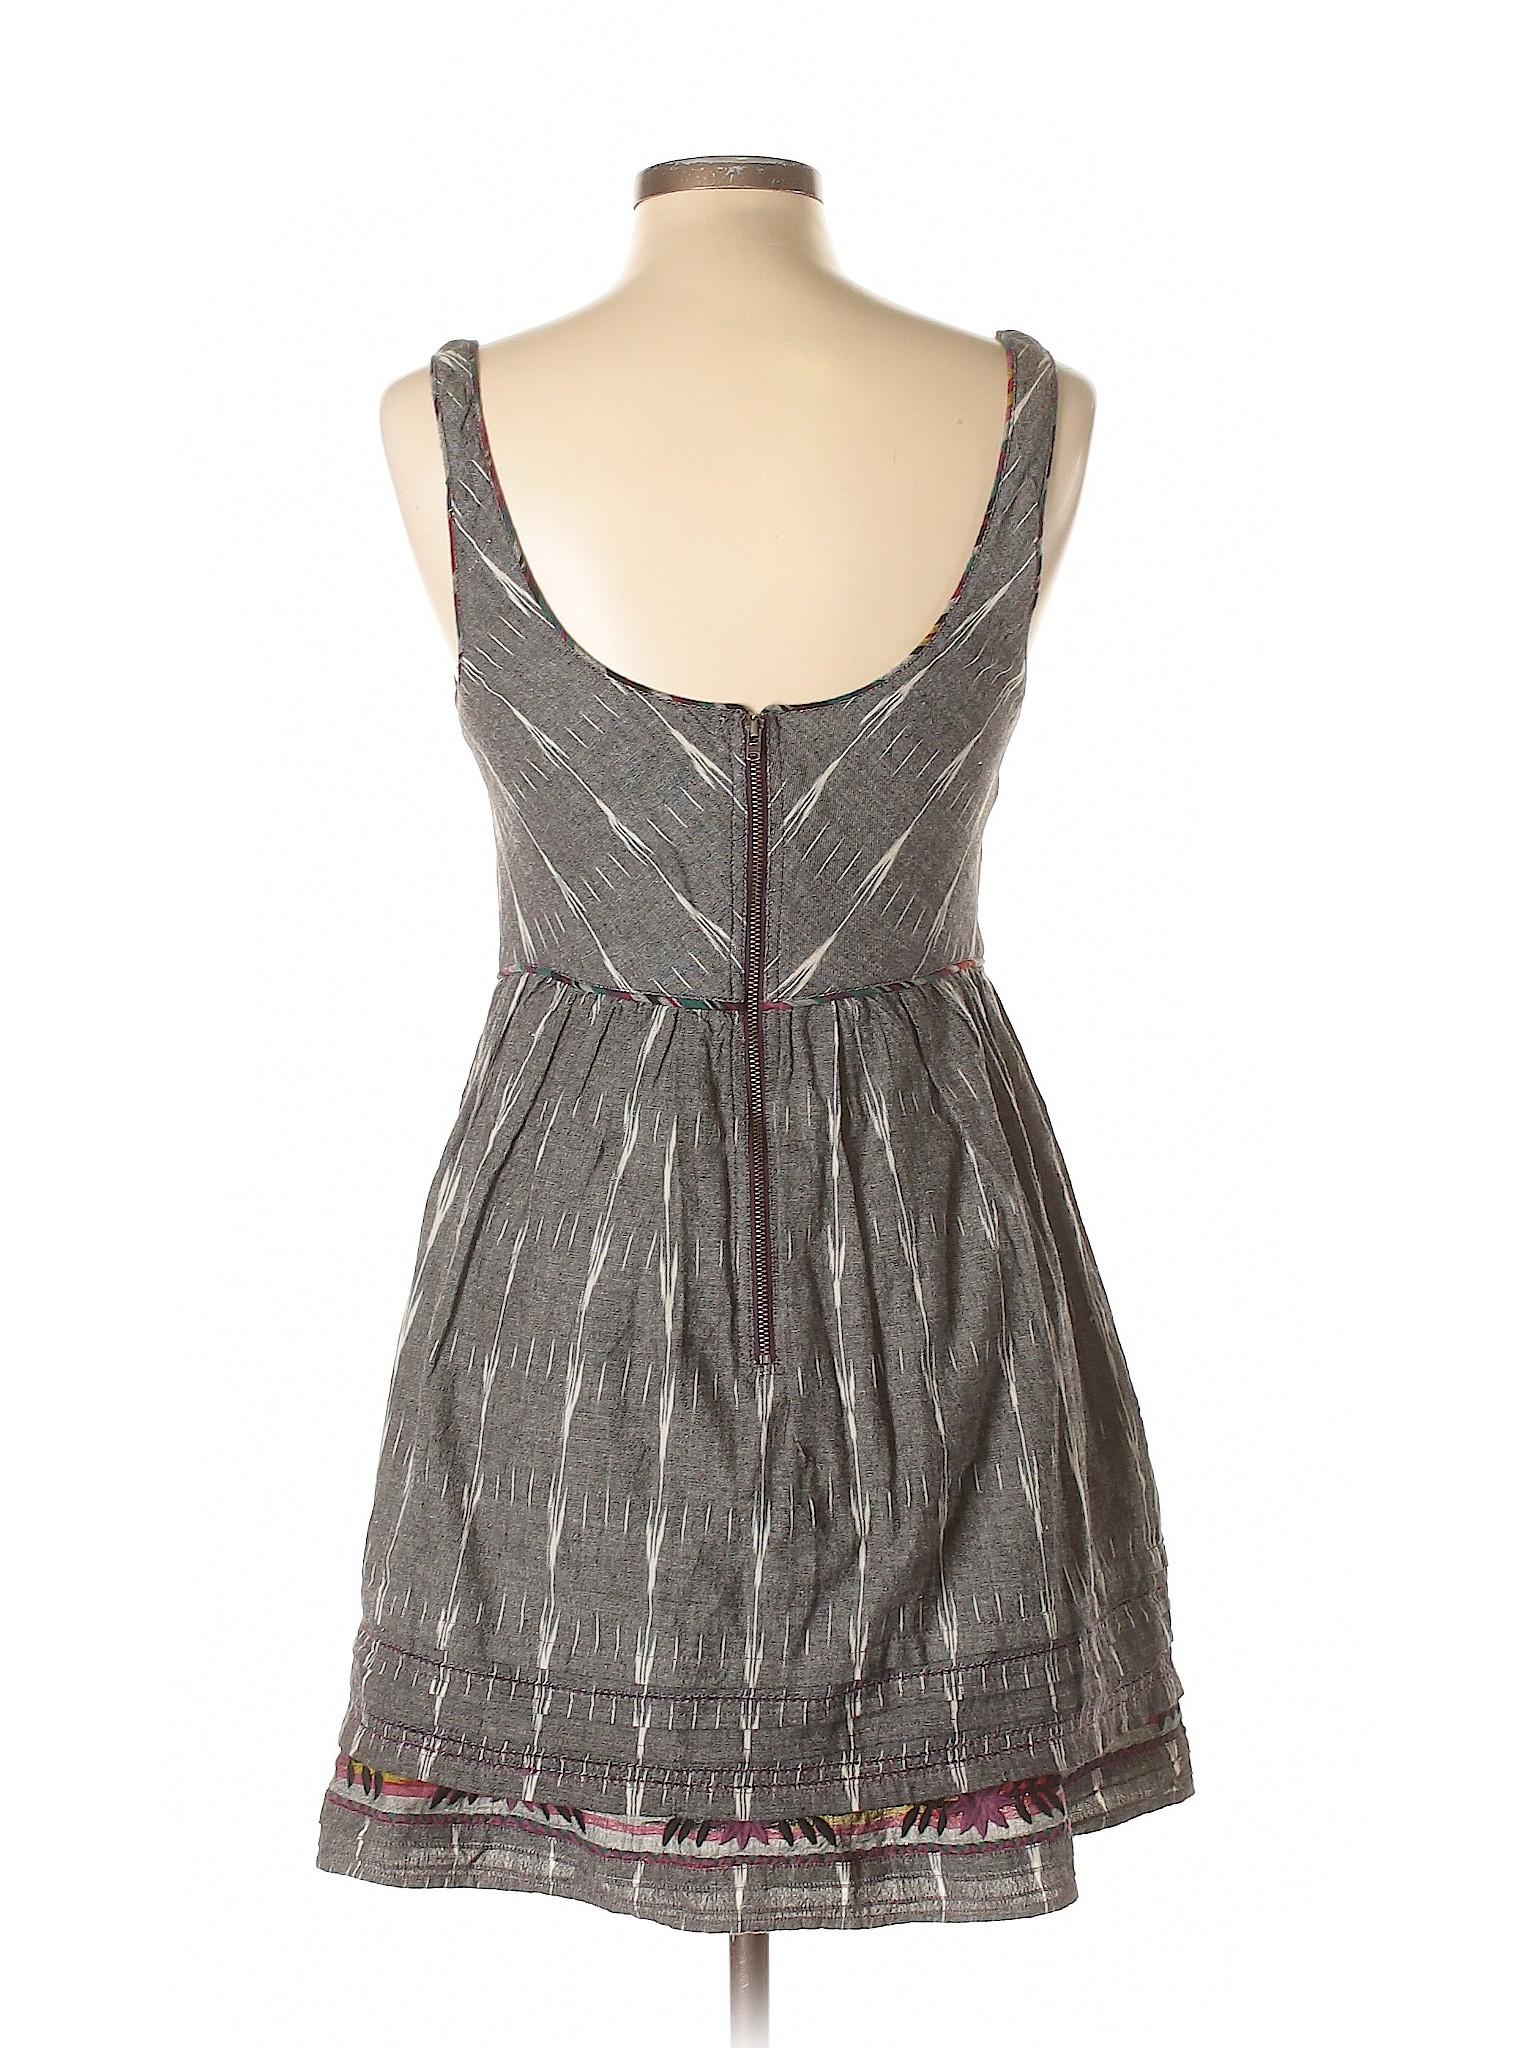 Boutique winter Casual New Romantics Dress rdvrqwt